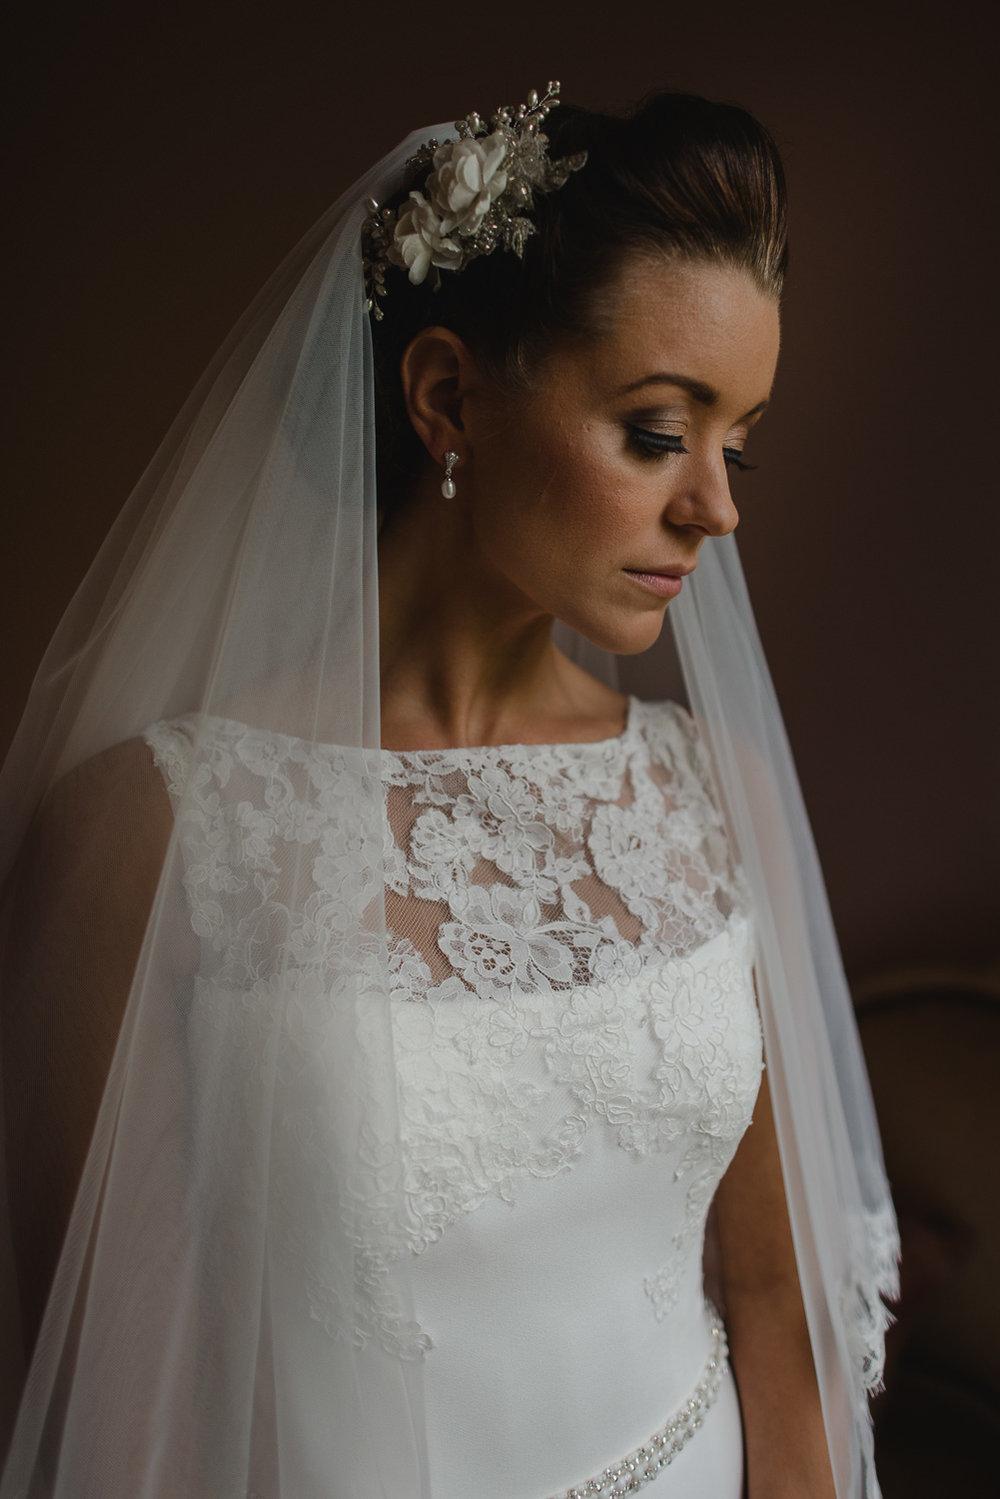 northern-ireland-wedding-photographer-esther-irvine-129.jpg